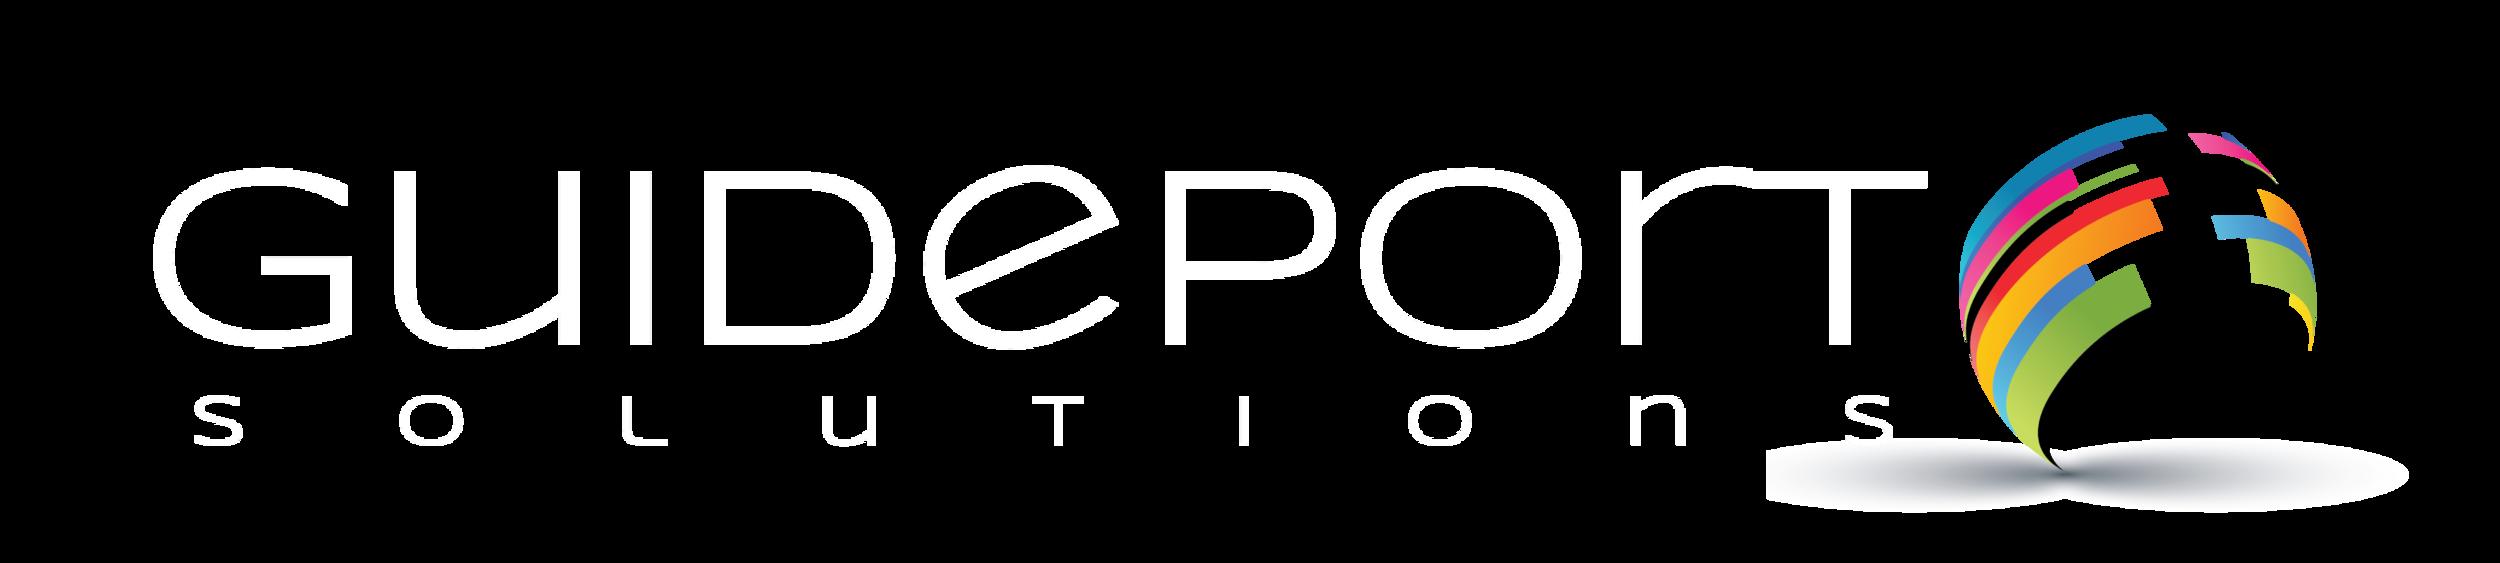 Guideport_Solutions_LLC_Logo_Transp-02.png